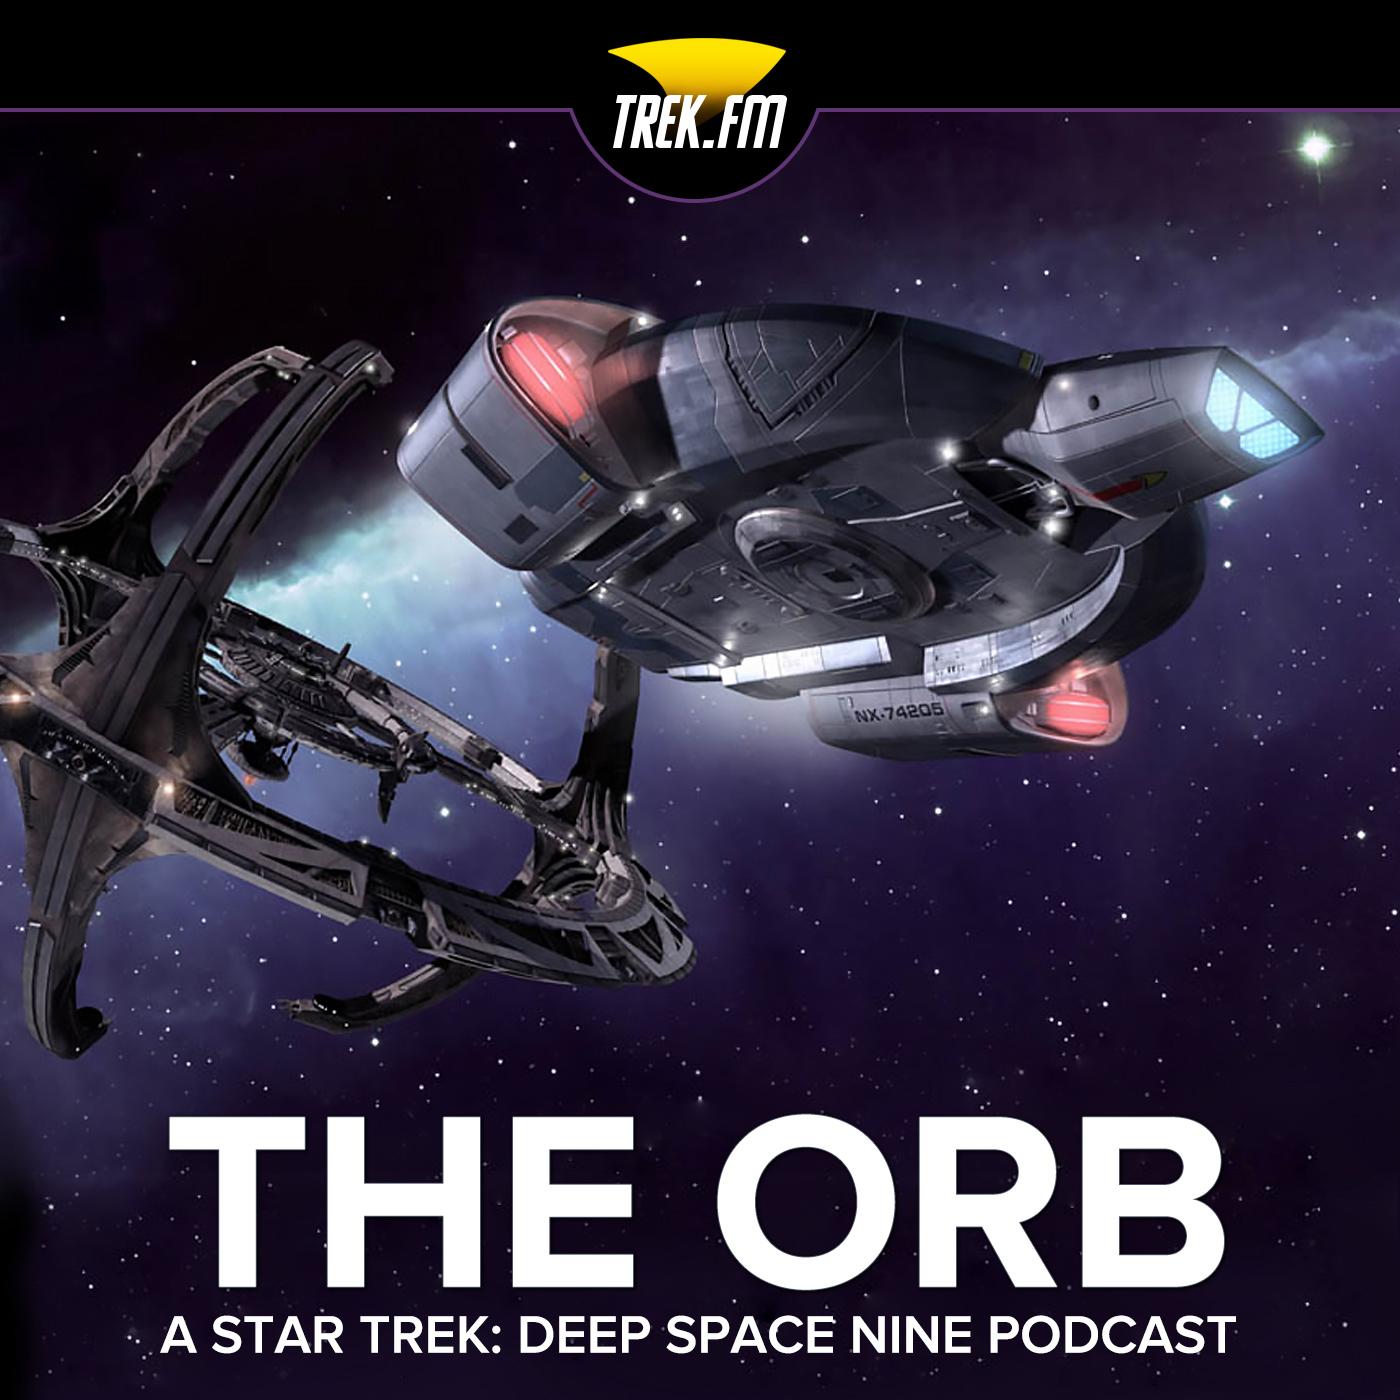 Star Trek Podcast | The Orb - Deep Space Nine | Trek.fm